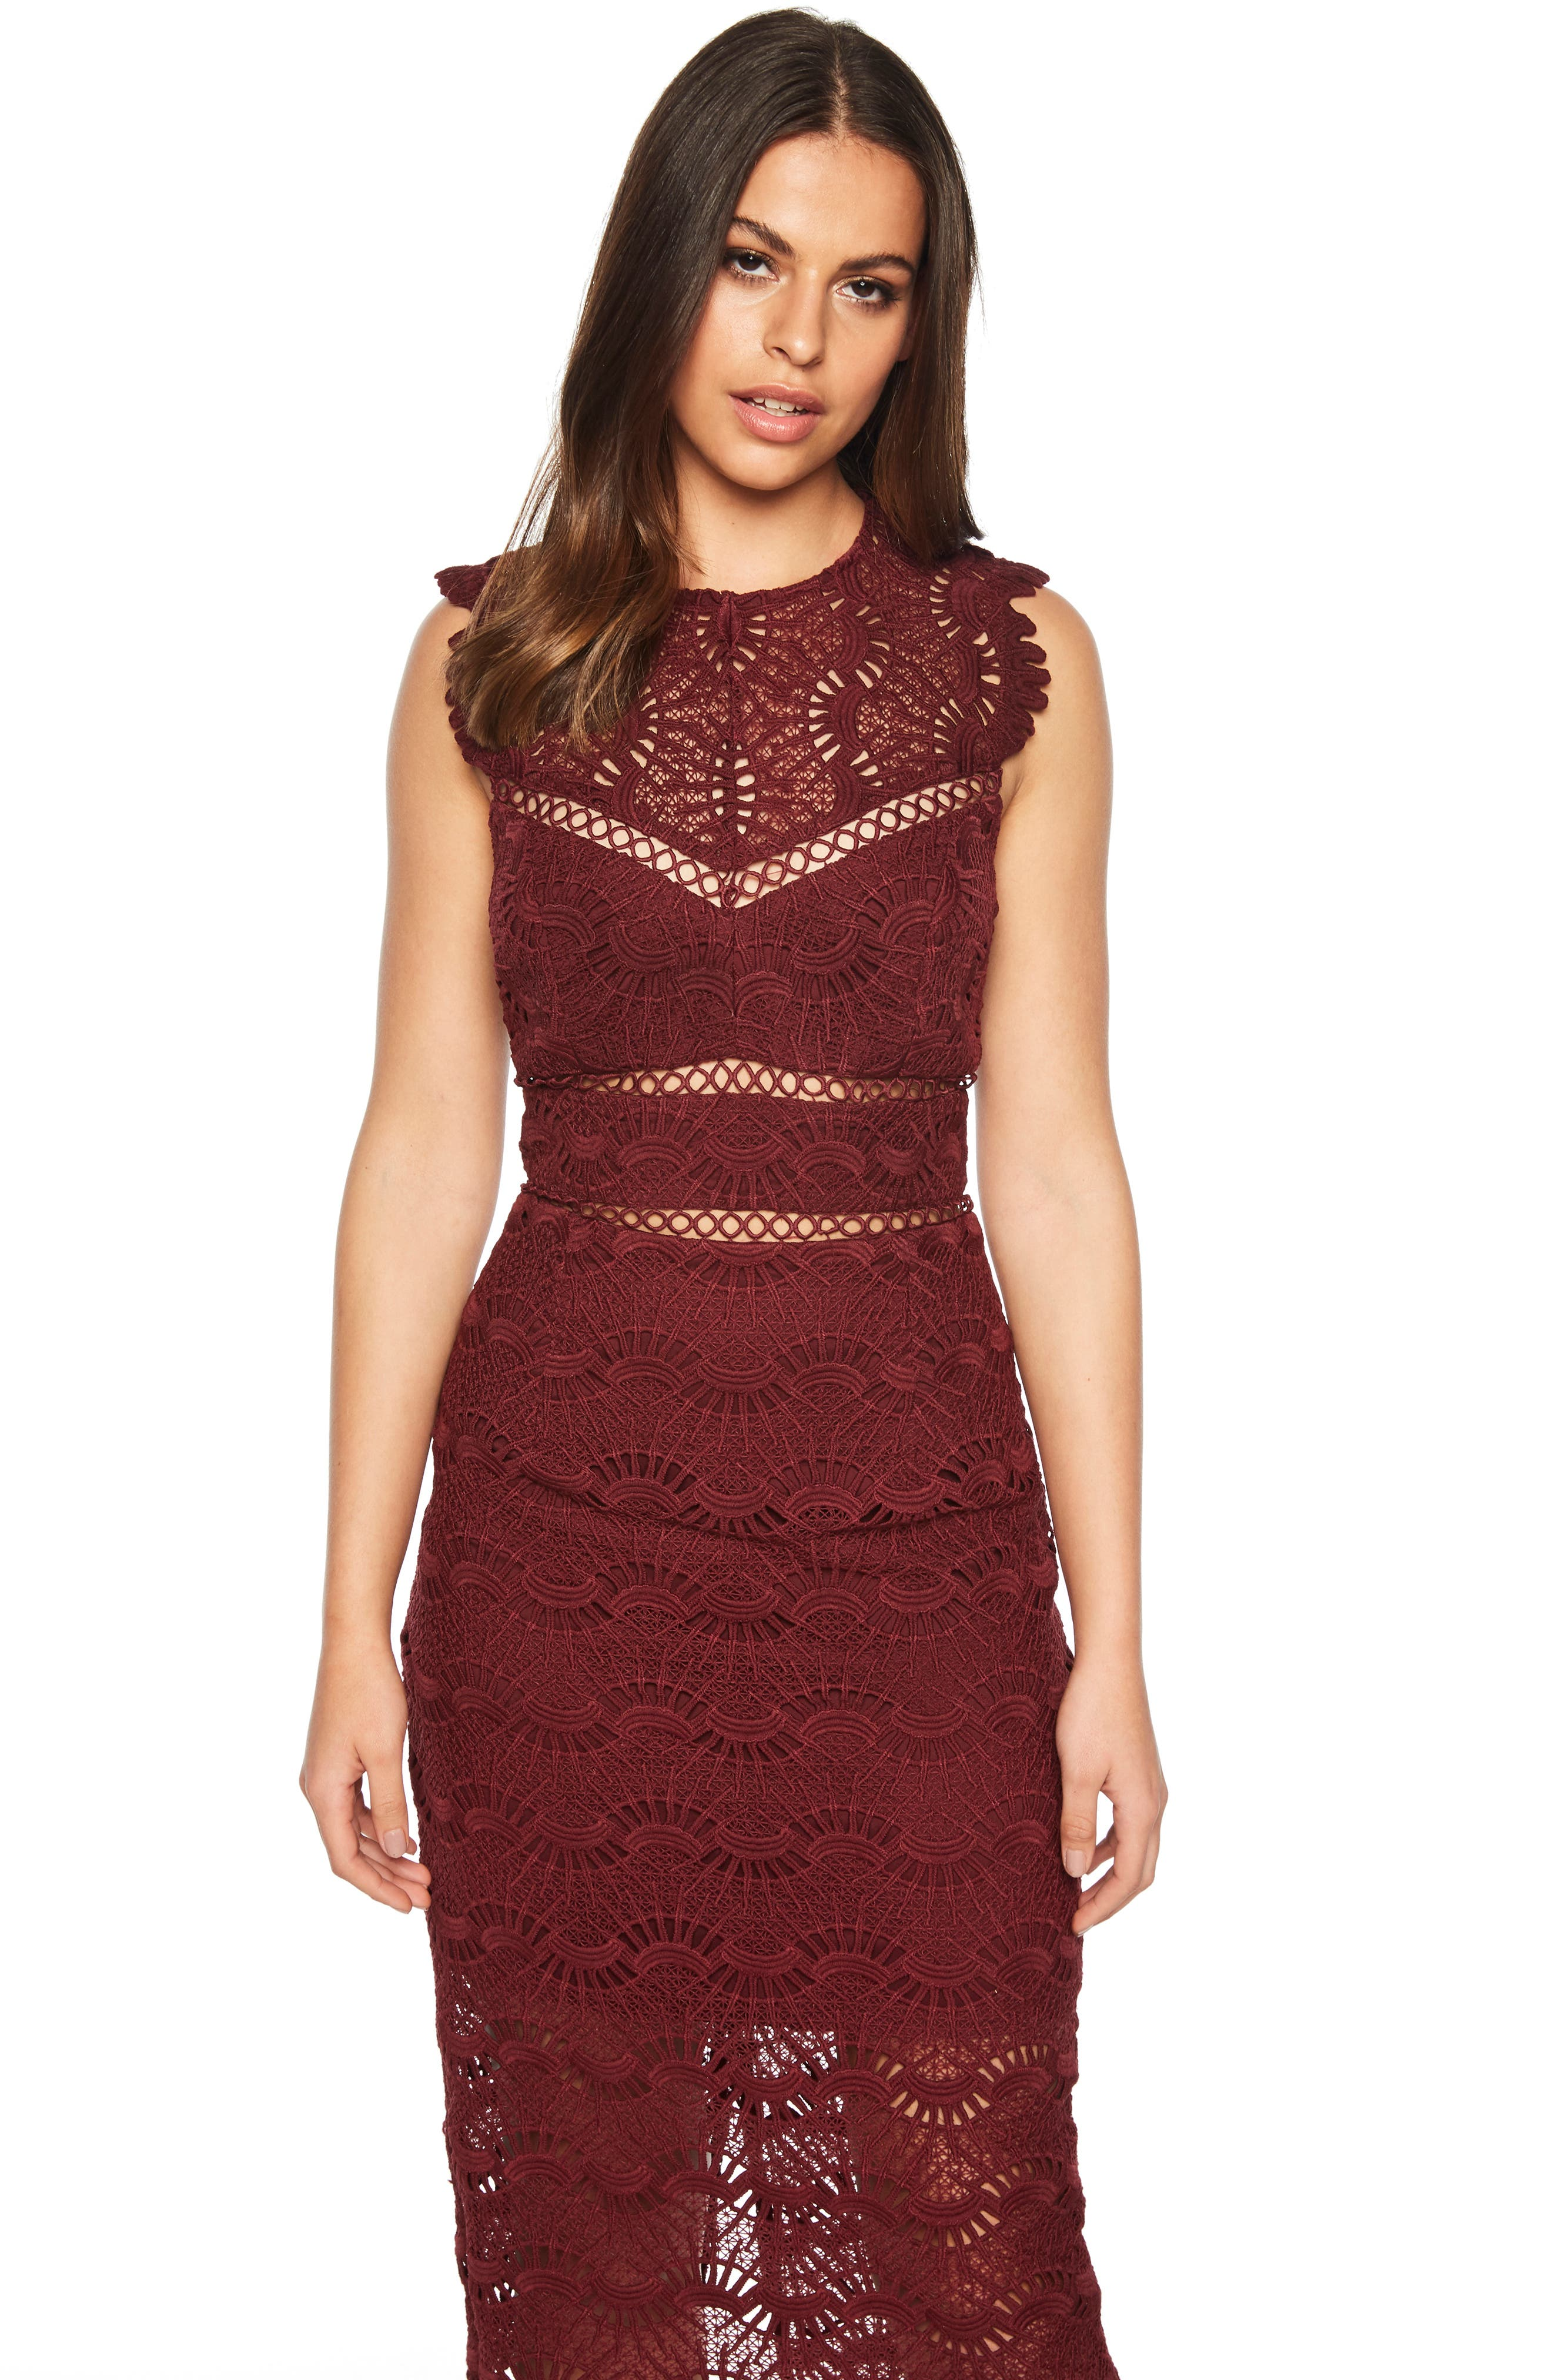 Mariano Lace Sheath Dress,                             Alternate thumbnail 9, color,                             601